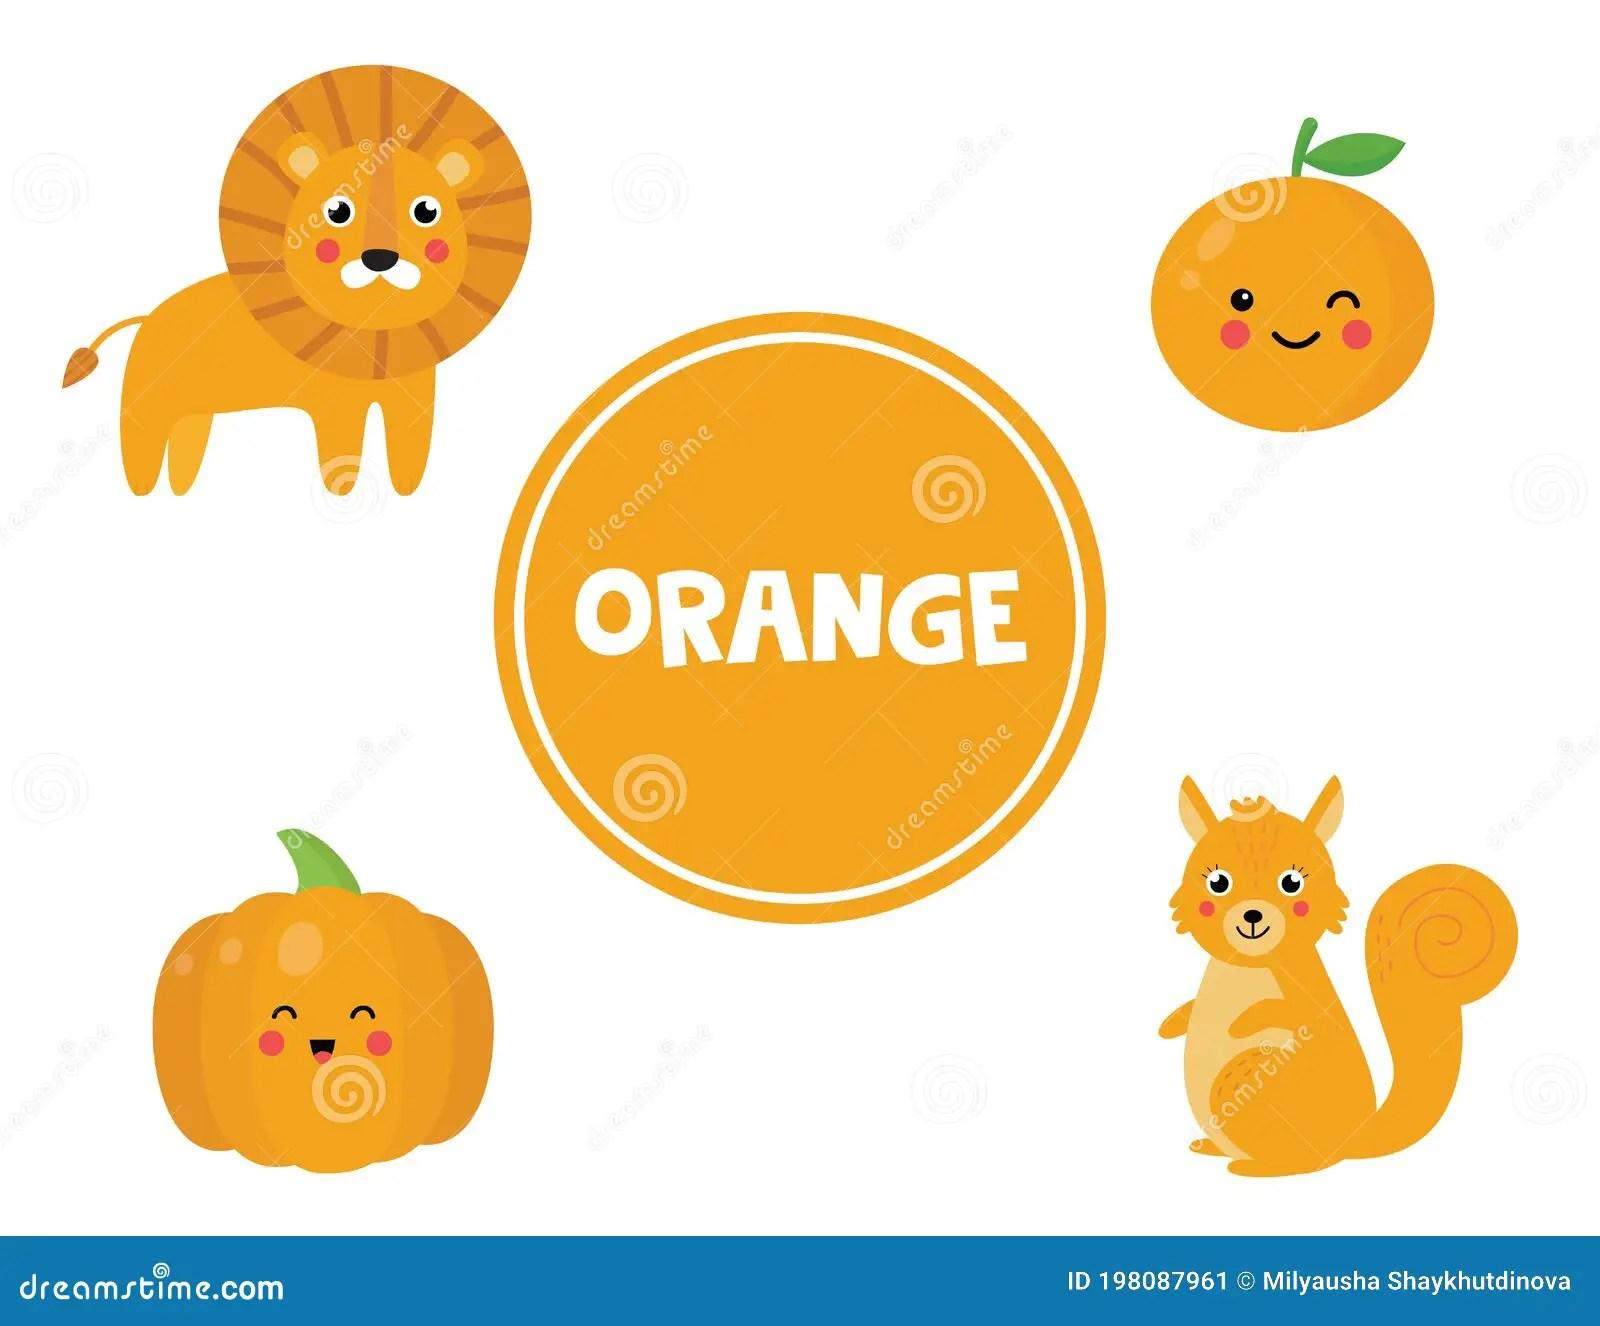 Learning Orange Color For Preschool Kids Educational